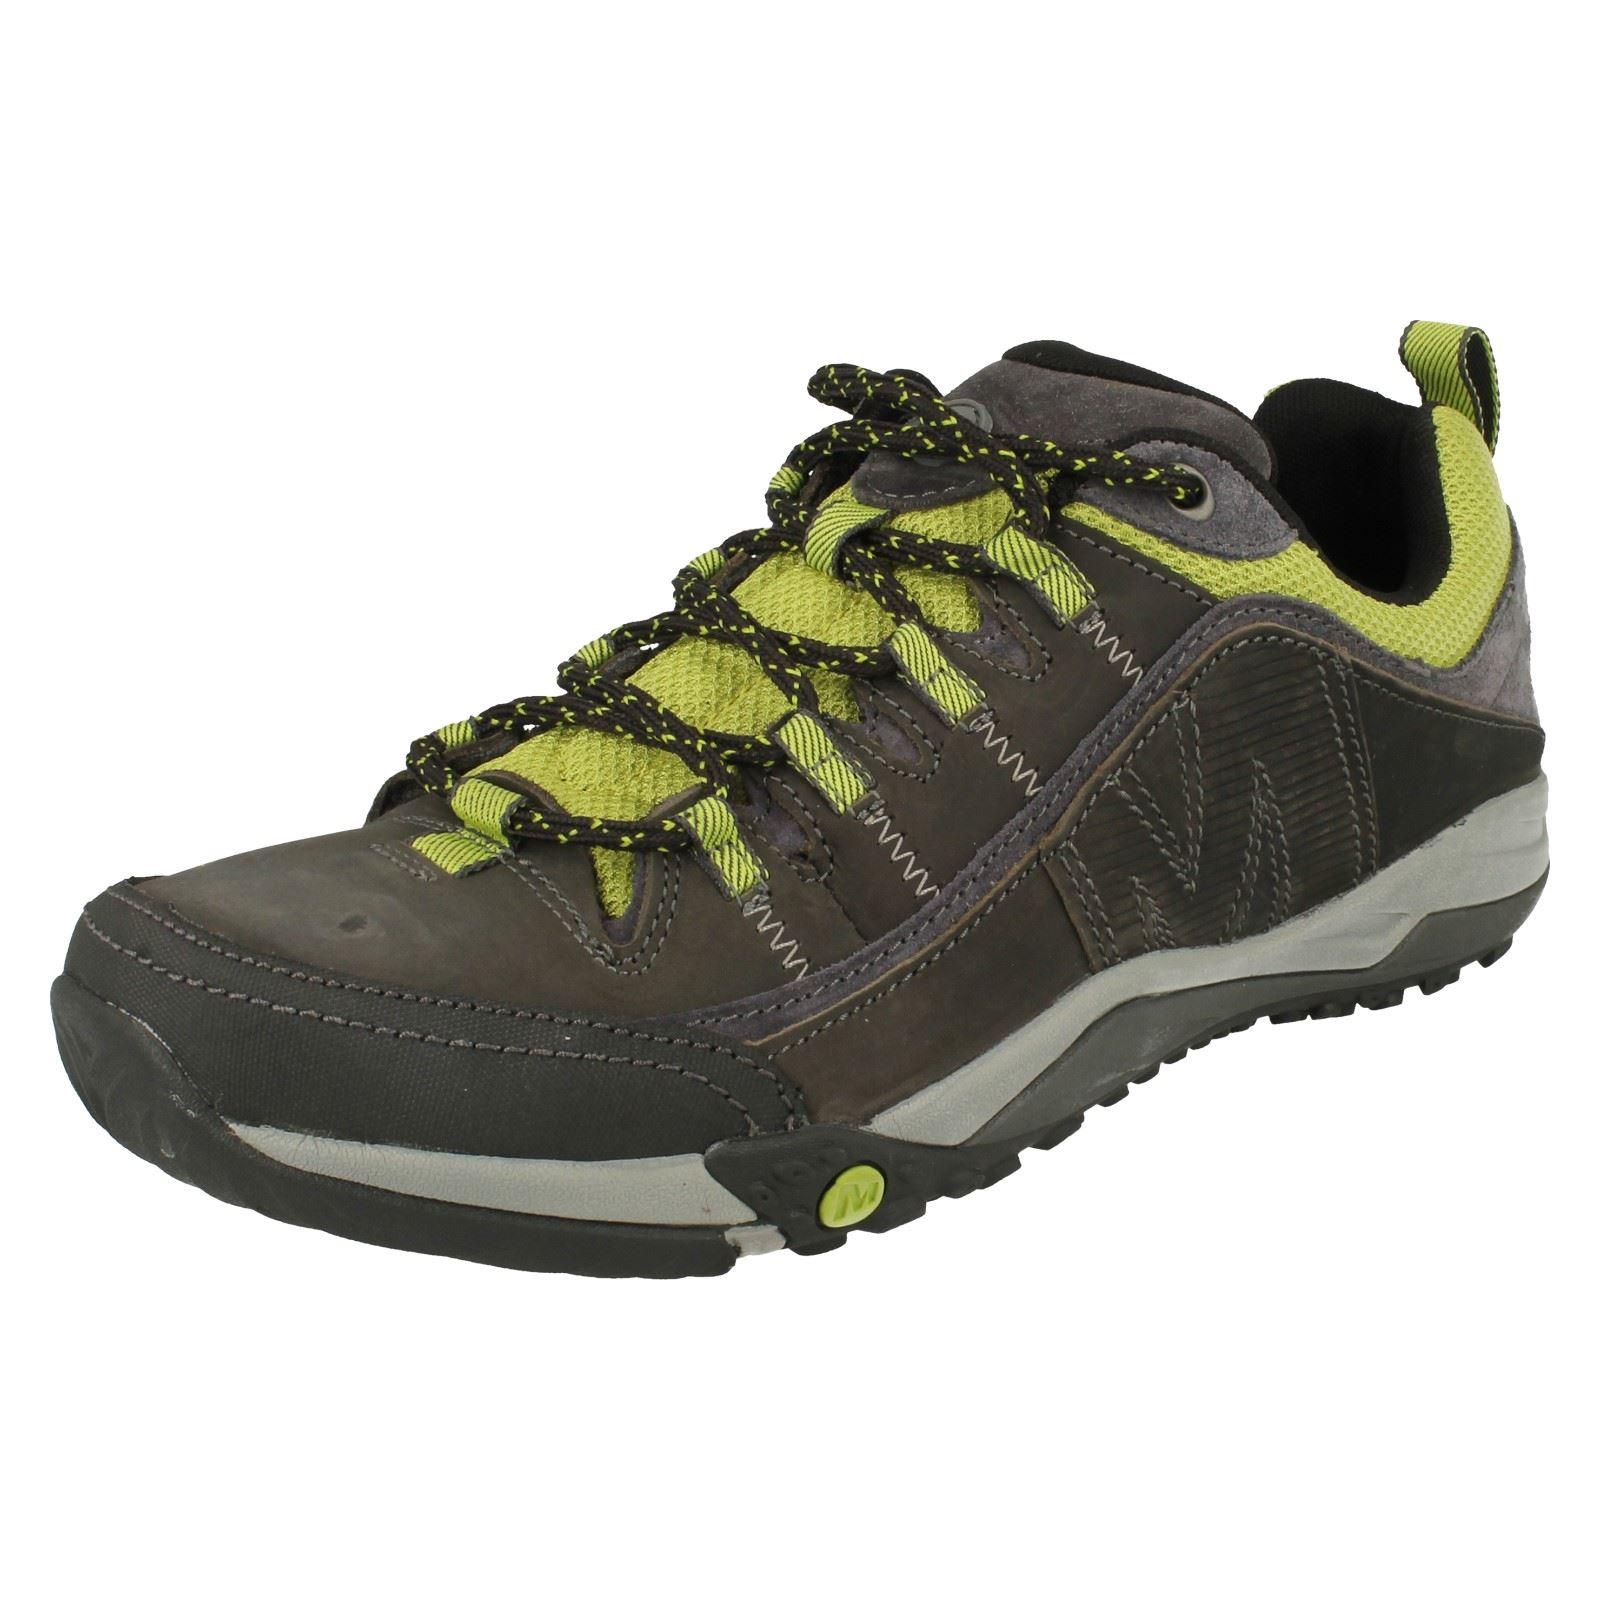 Zapatos Merrell Helixer distort en color negpo para hombre